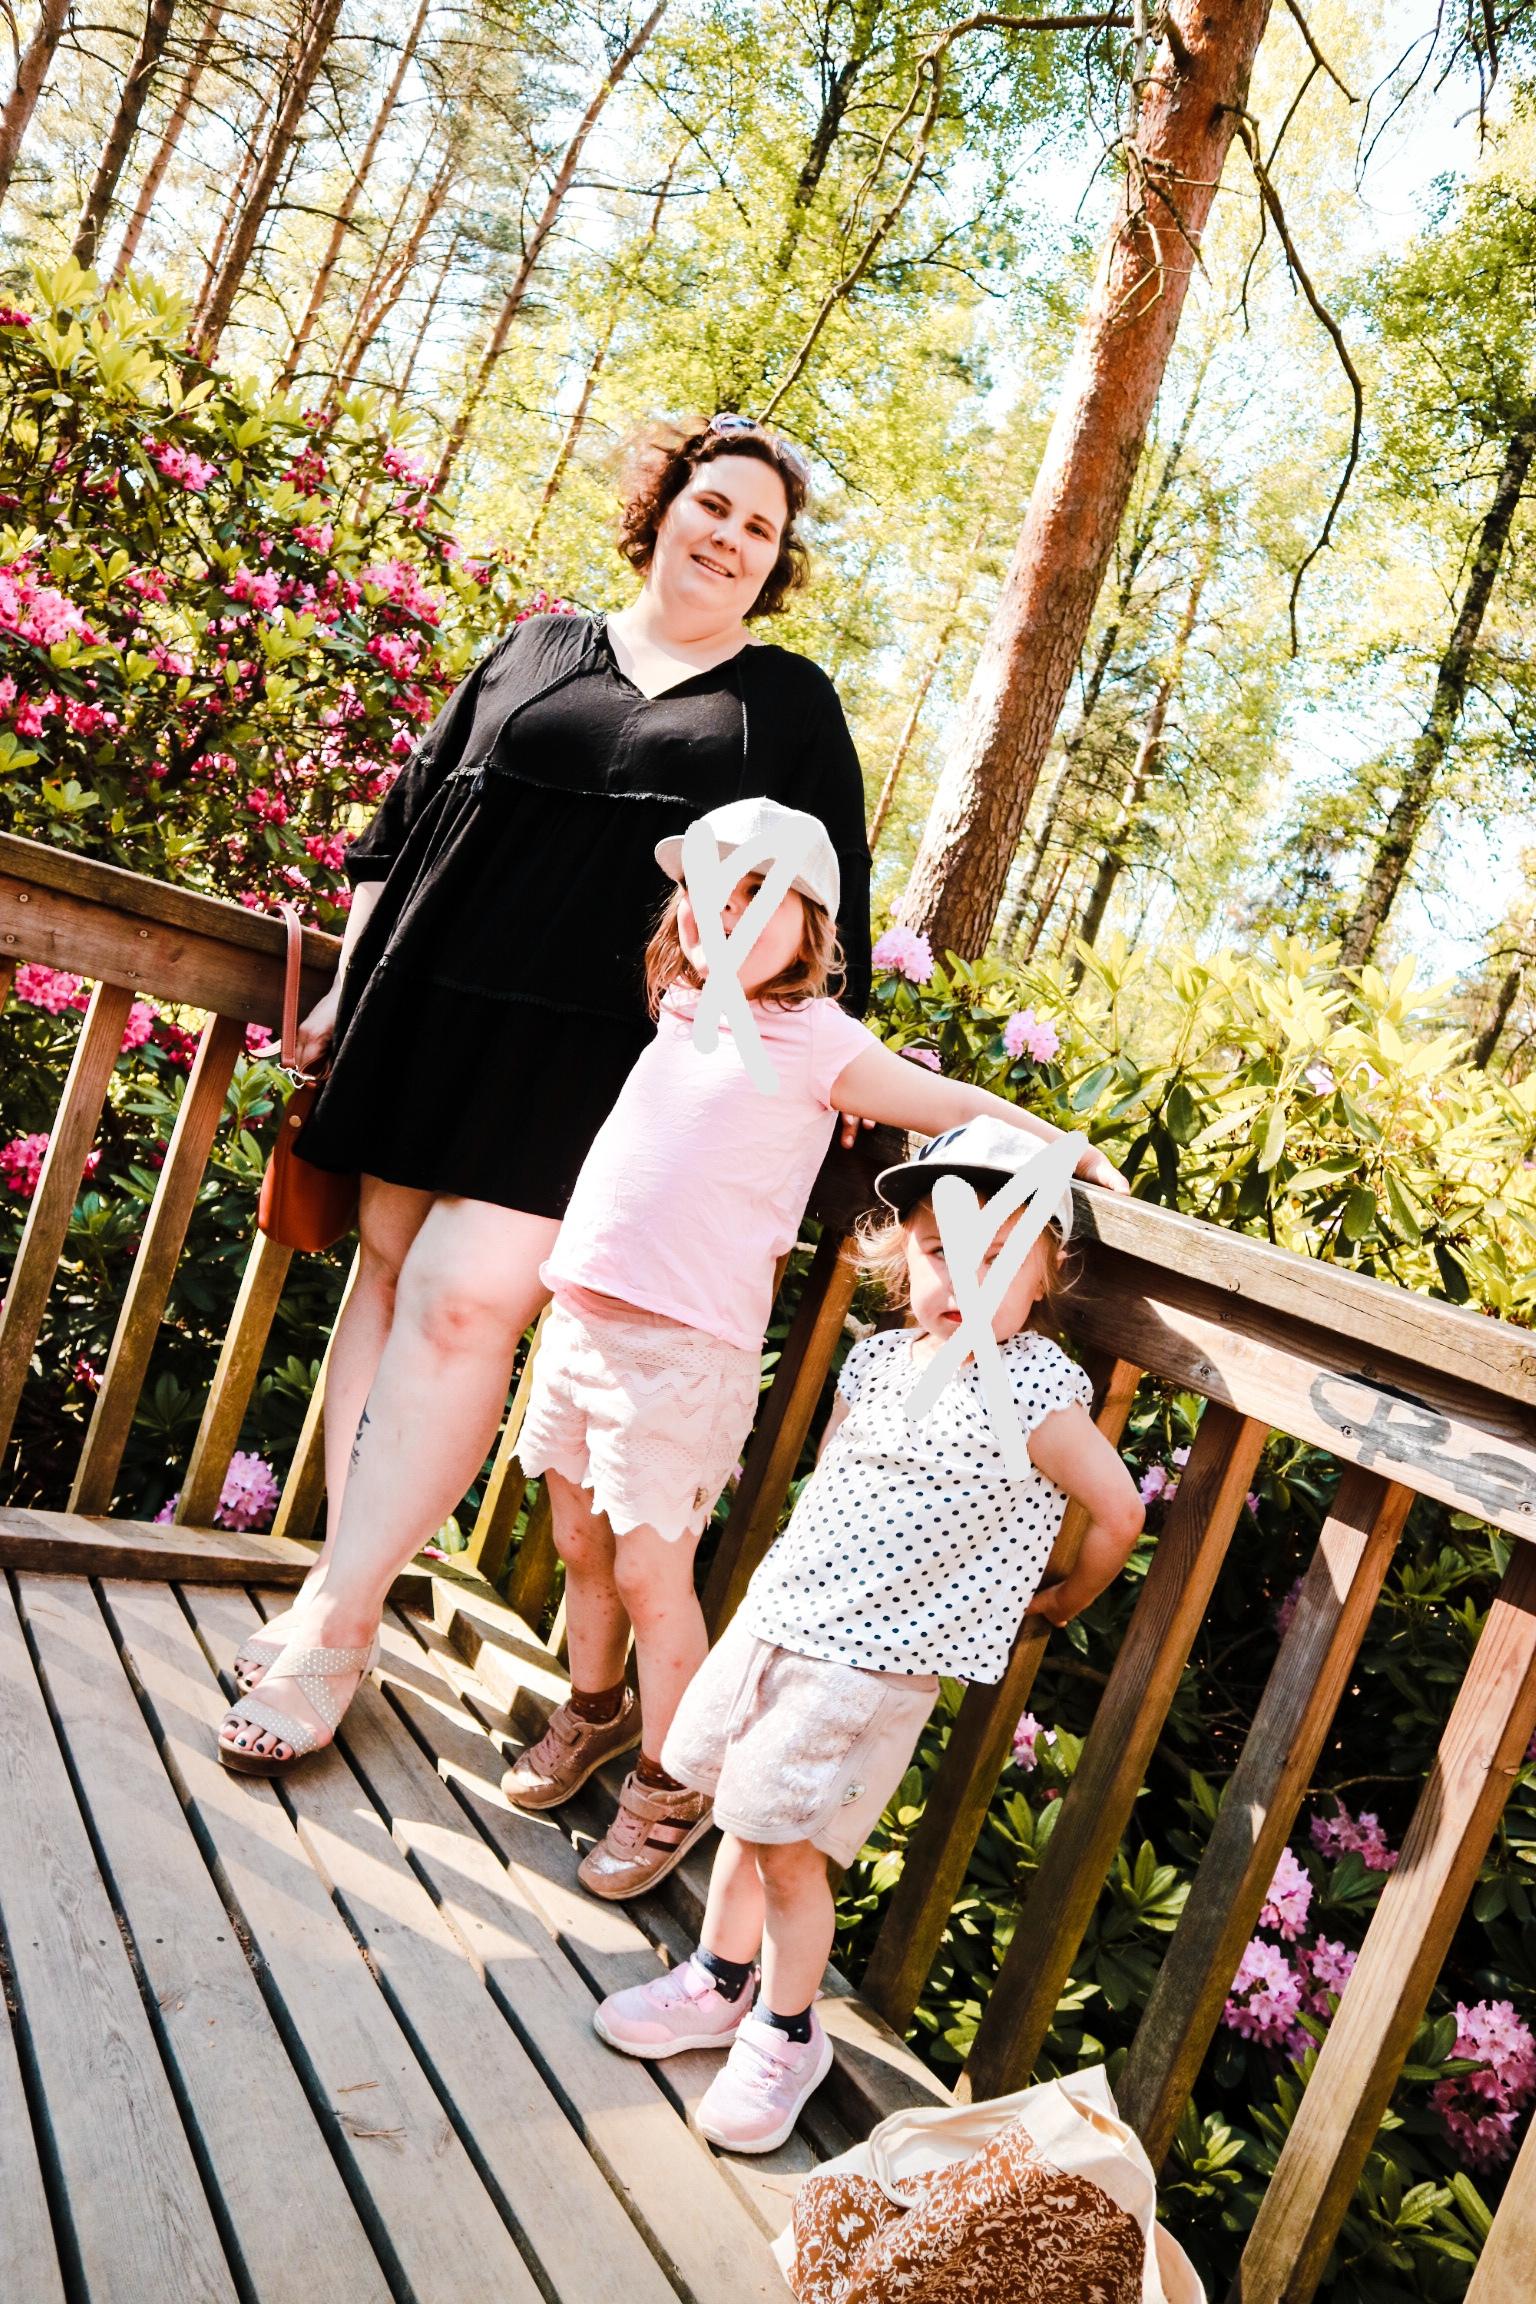 Big mamas home by Jenni S. Arki just nyt